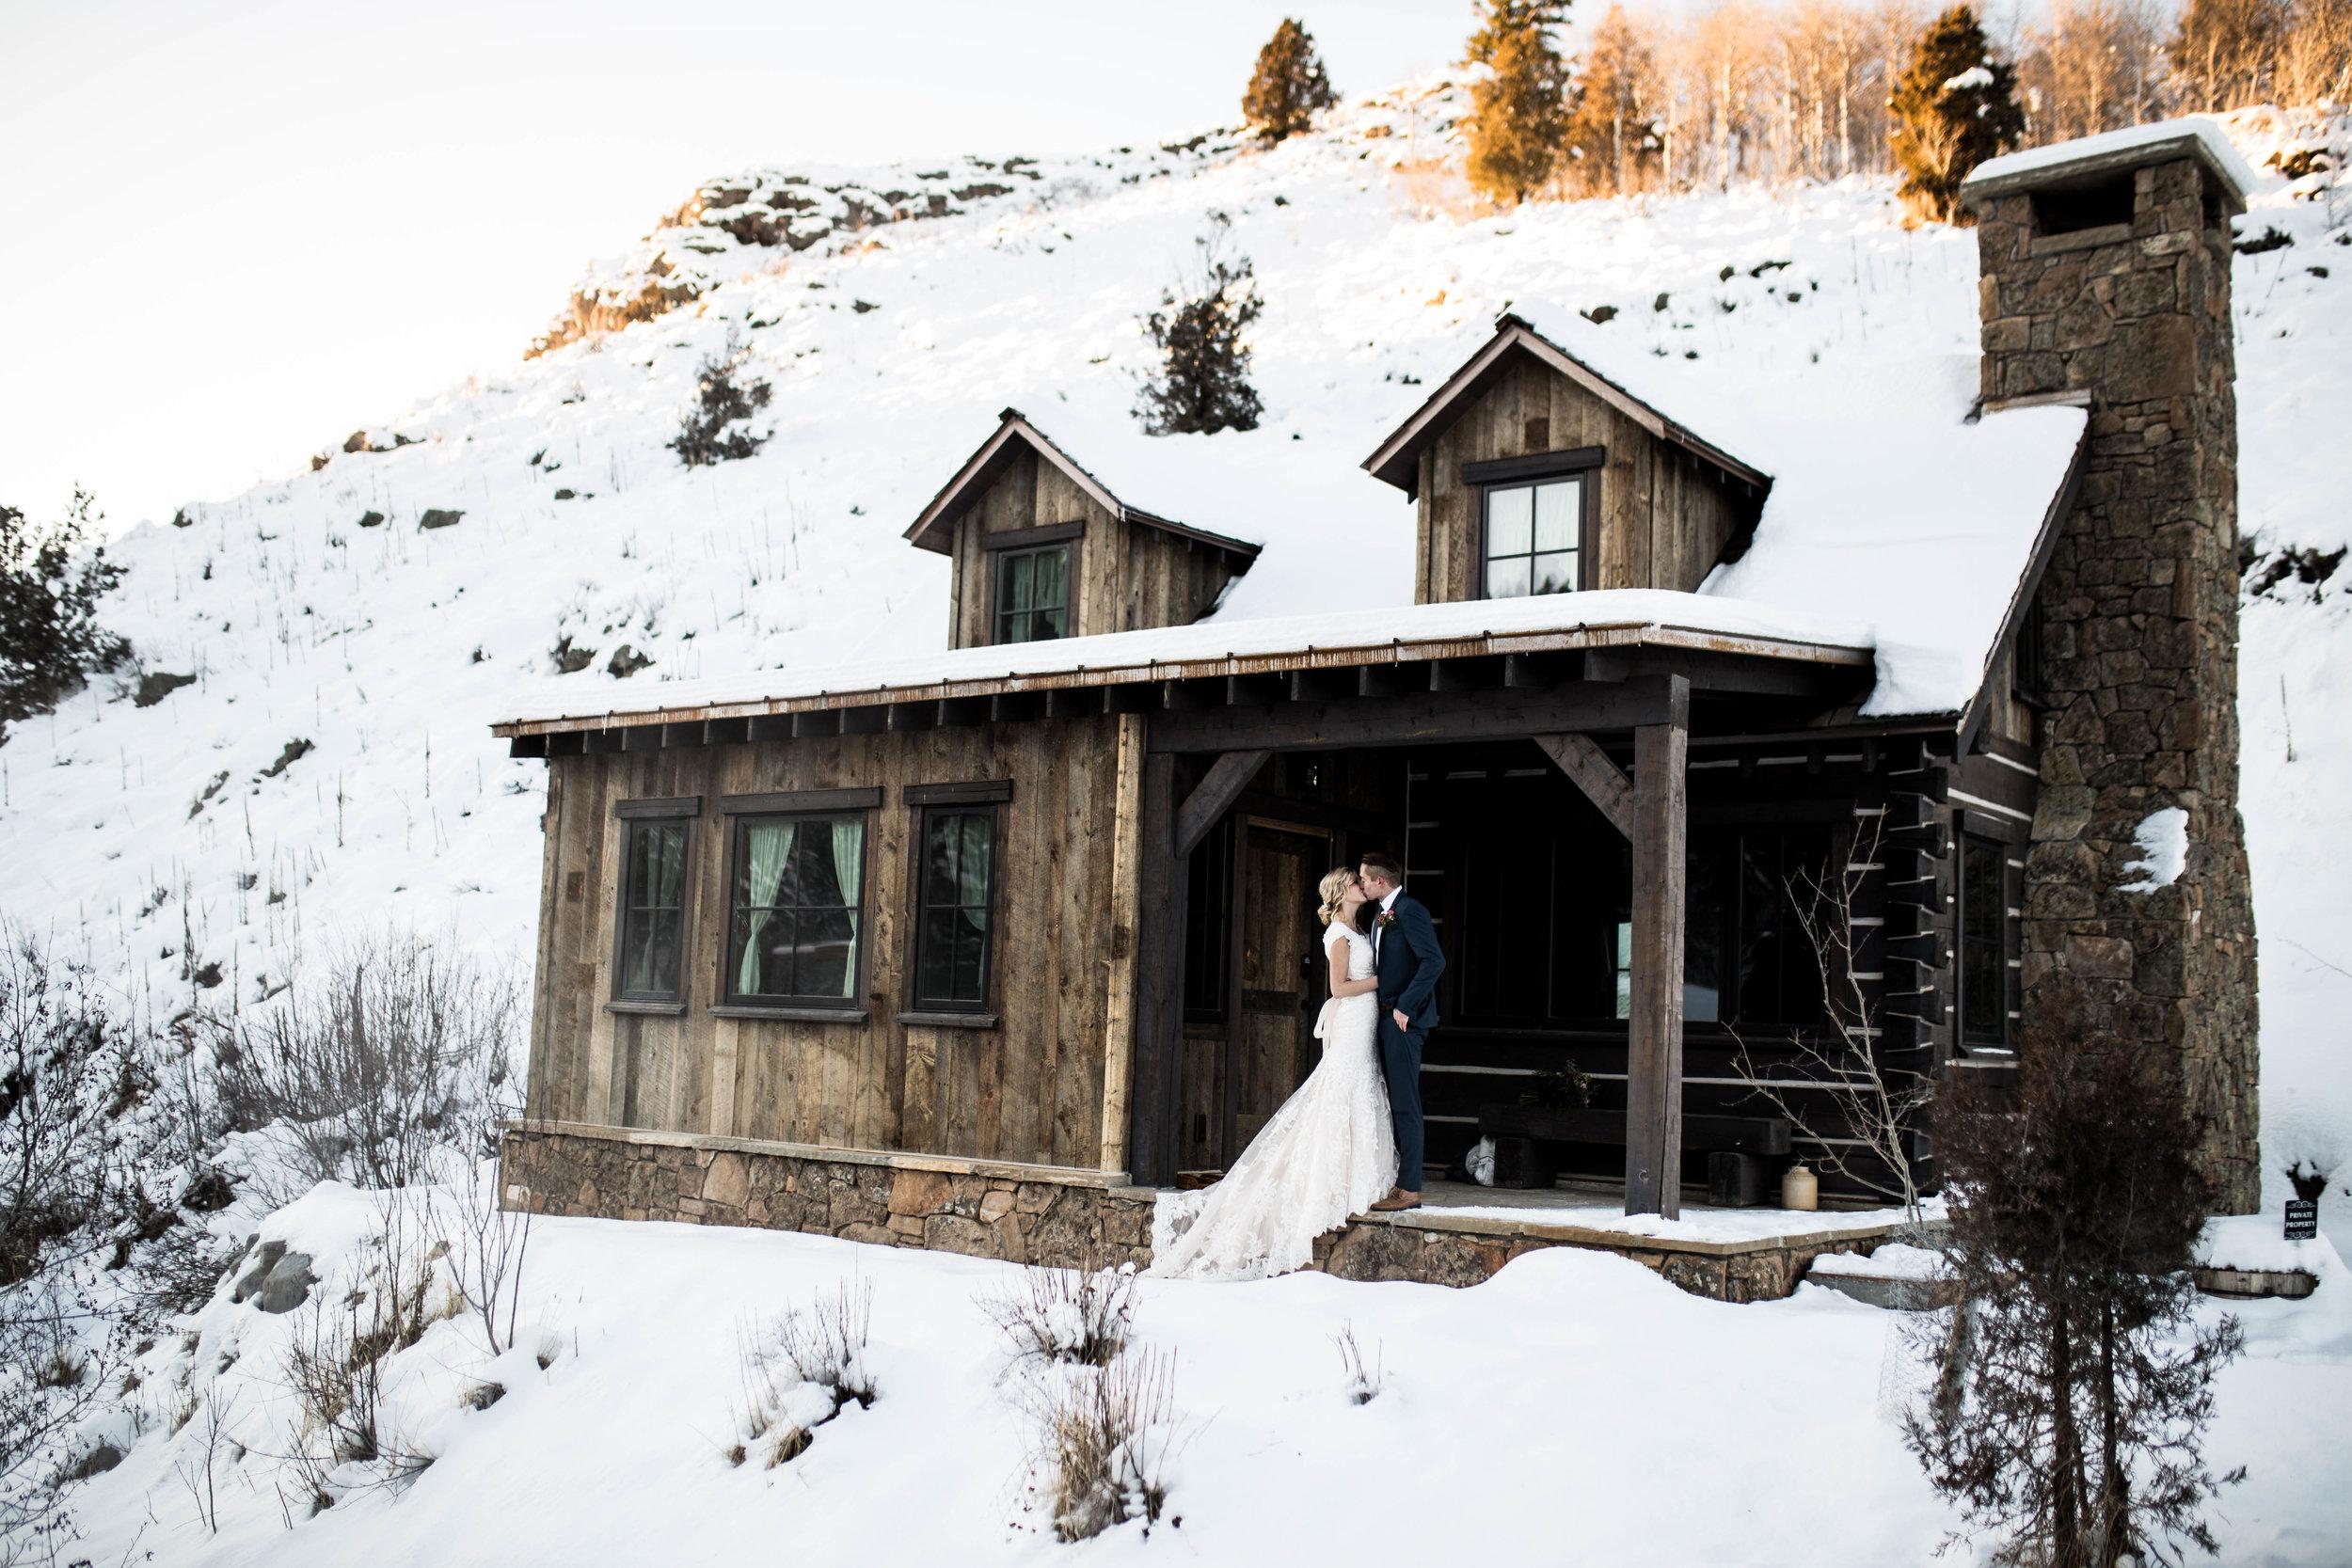 WinterWeddingBridalsTarghee (64 of 121).jpg